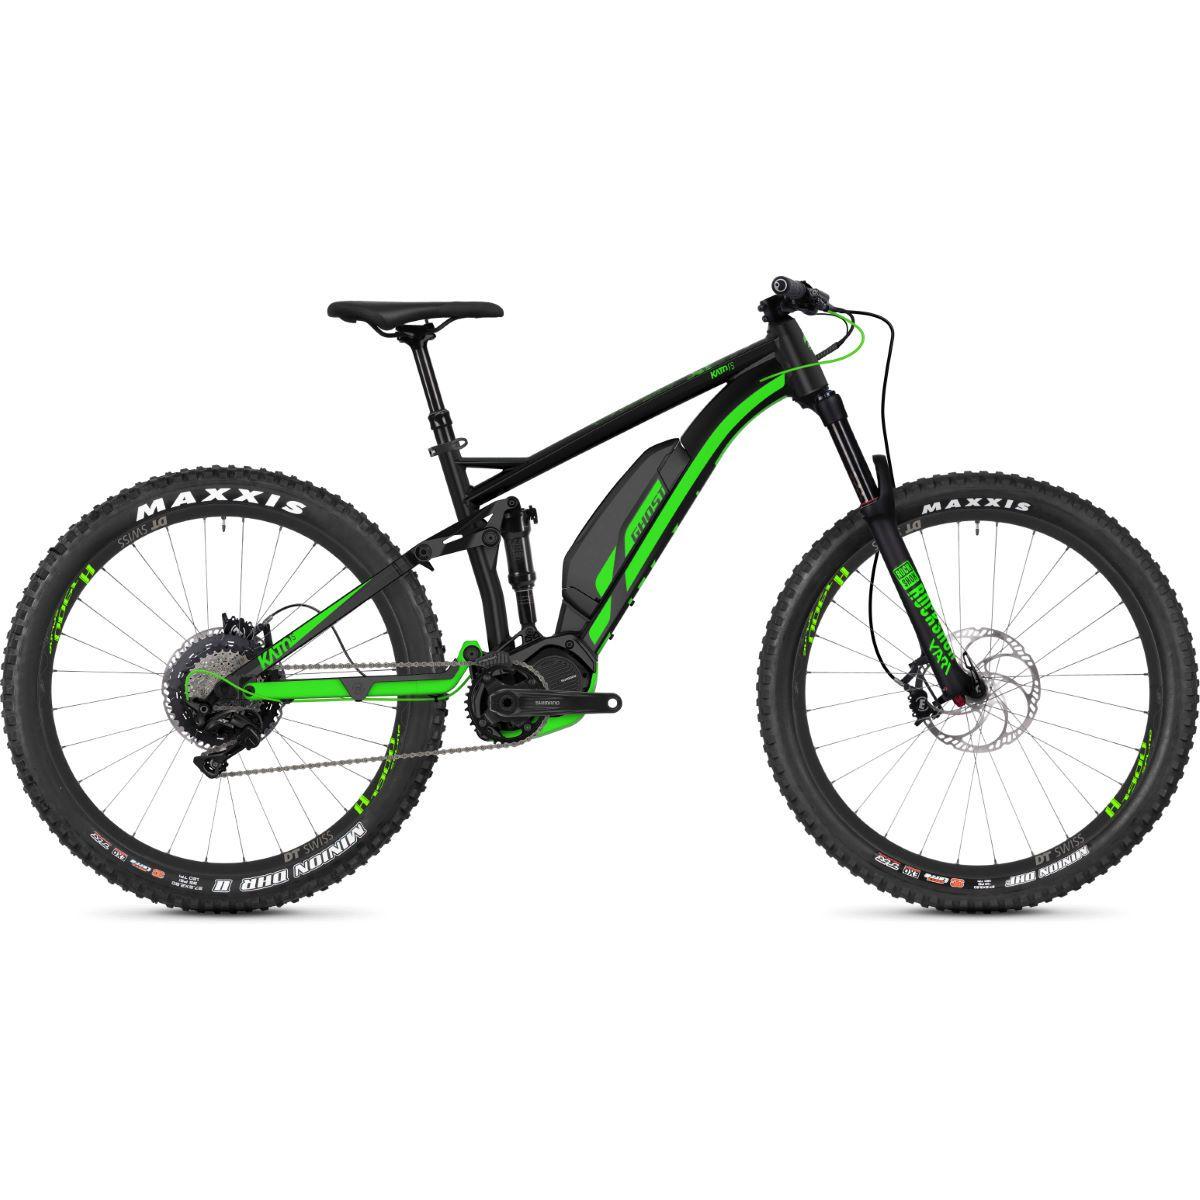 Ghost Kato Fs S6 7 2018 E Bike Full Suspension Mountain Bikes